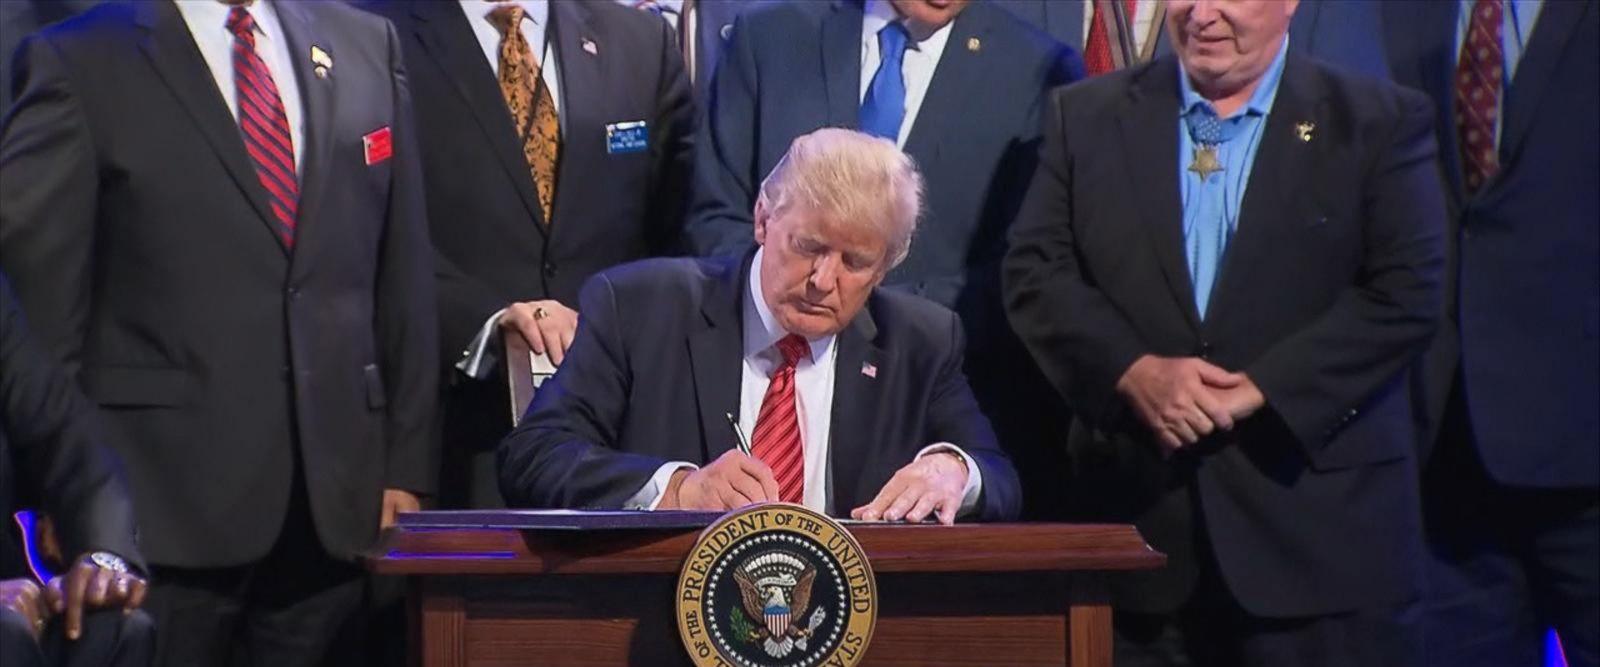 VIDEO: Trump returns to Washington after split speeches